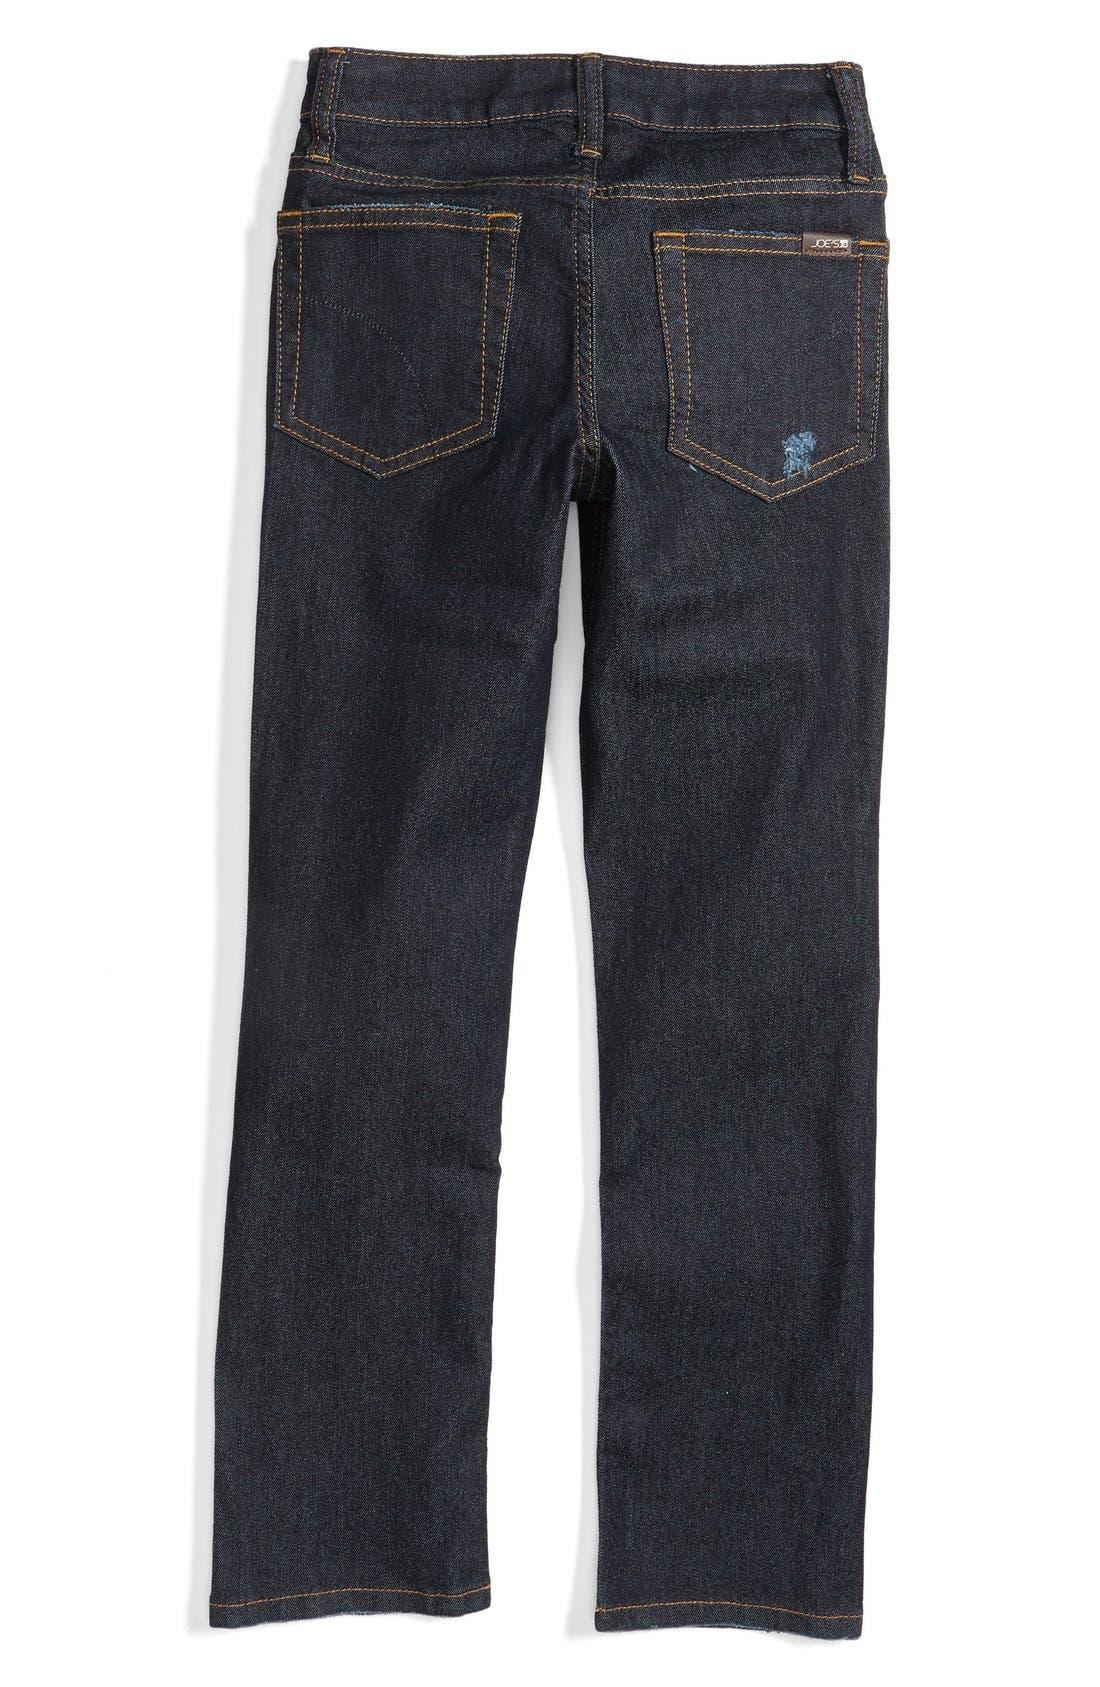 Brixton Straight Leg Jeans,                             Alternate thumbnail 4, color,